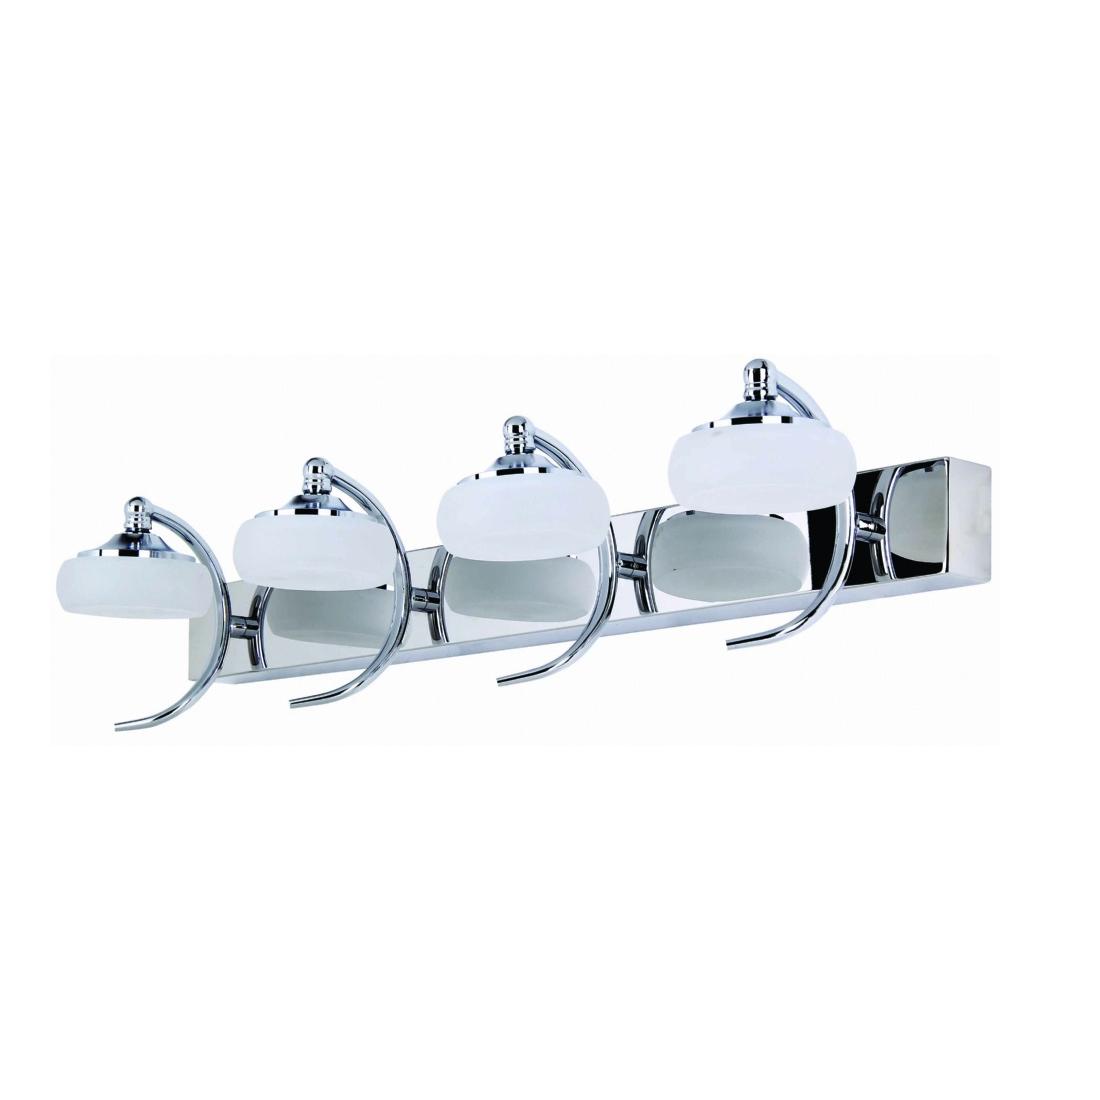 K2 GLOBAL KSL184 - Dekoratif LED Aplik